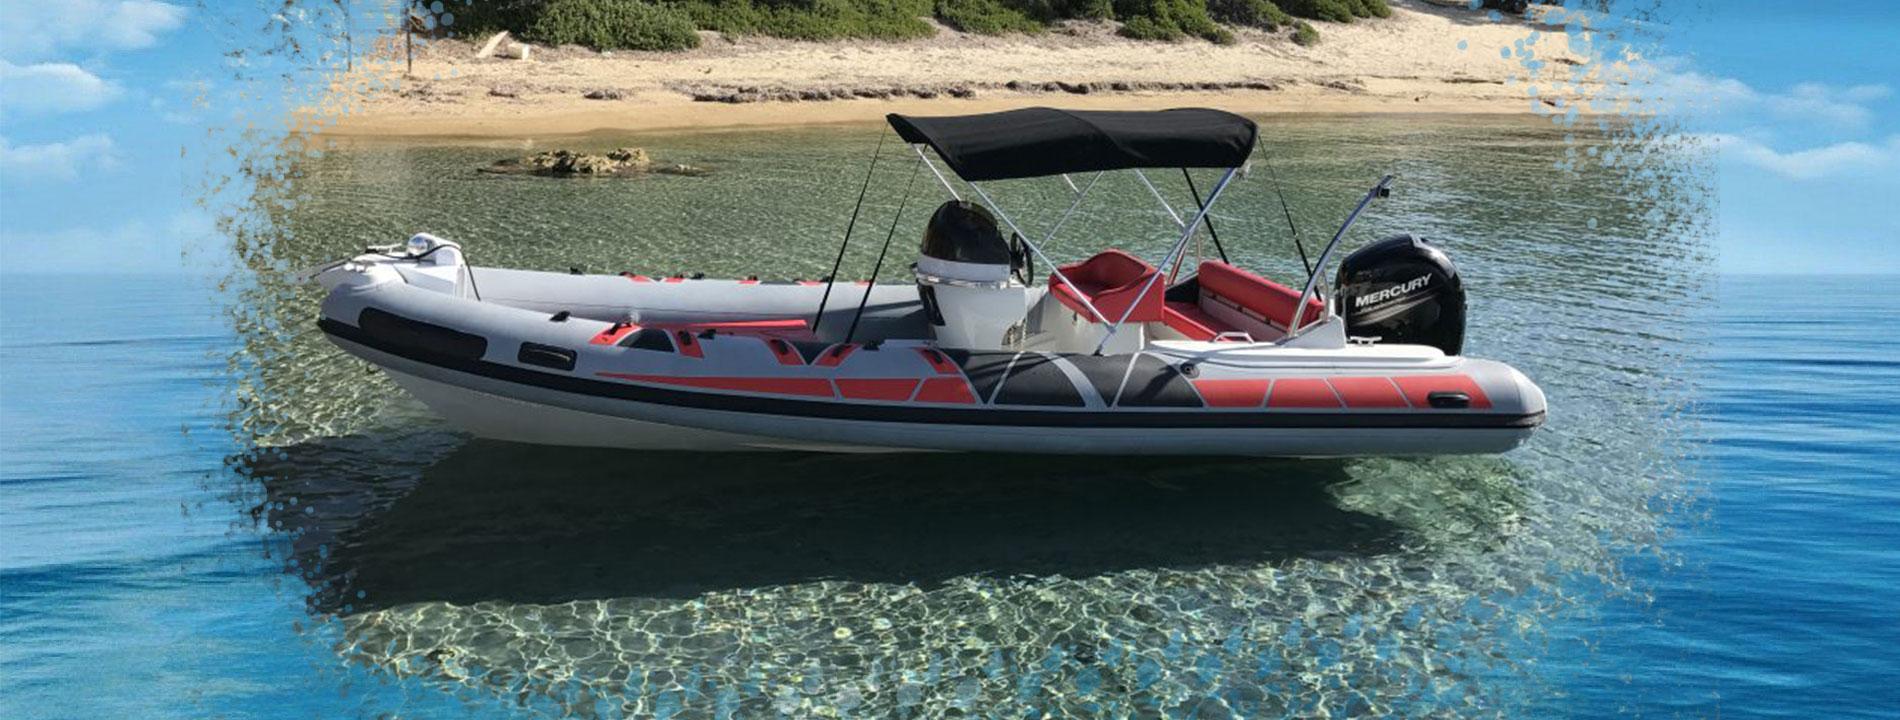 skiathos rent boats,skiathos rental boats,skiathos boats for hire,skiathos boats,skiathos boat hire,skiathos,greece